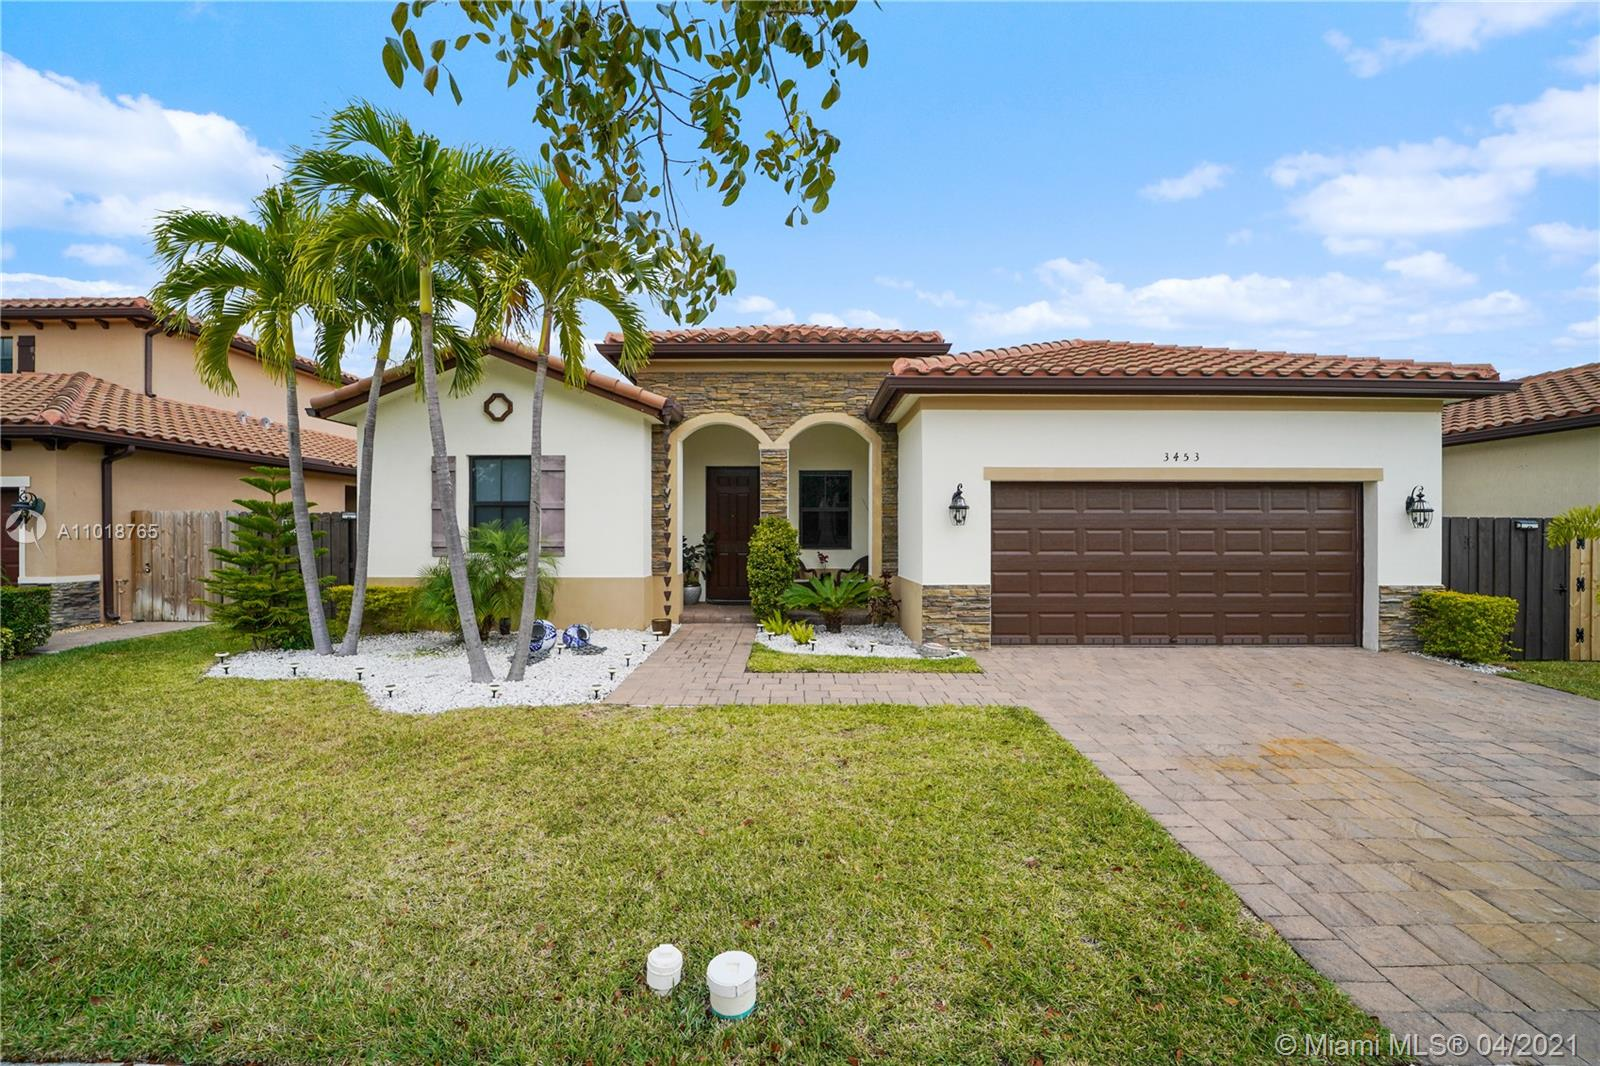 3453 SE 3rd St Property Photo - Homestead, FL real estate listing